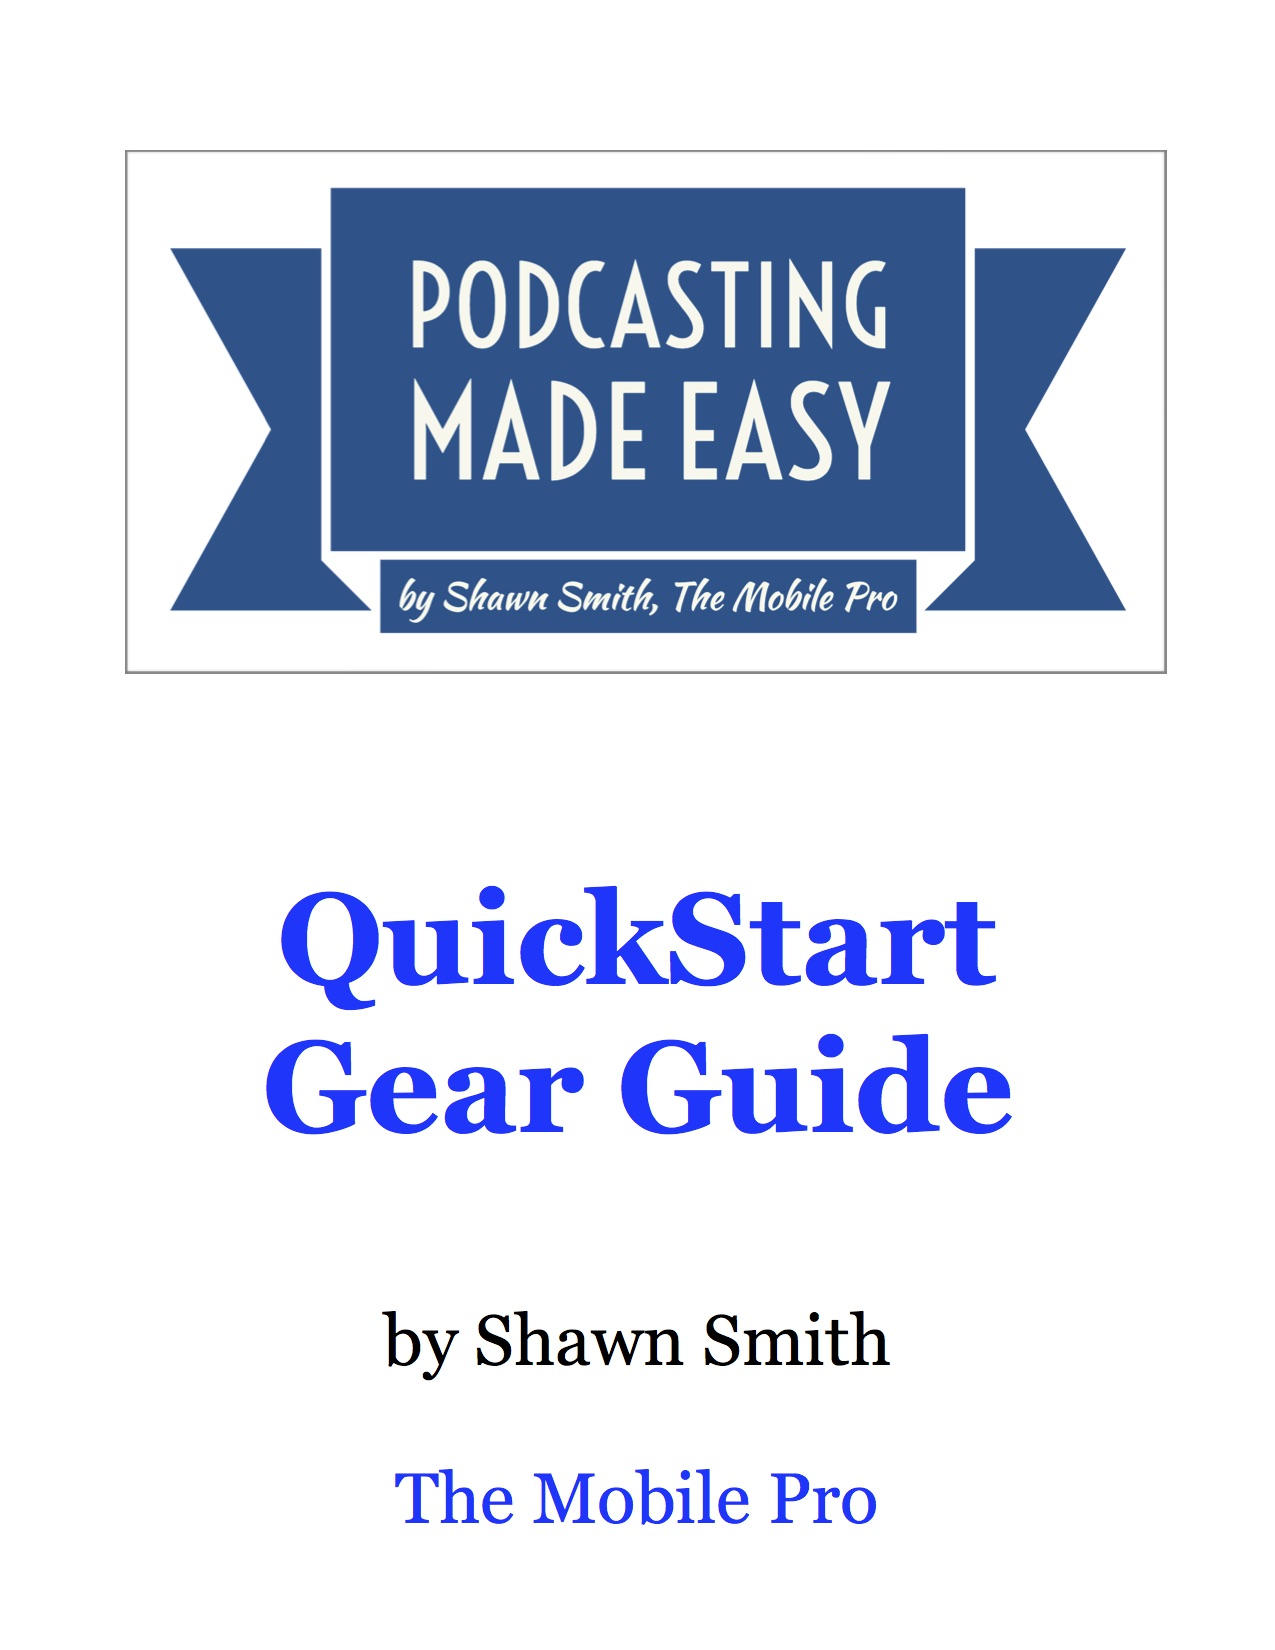 PME - QuickStart Gear Guide Cover.jpg